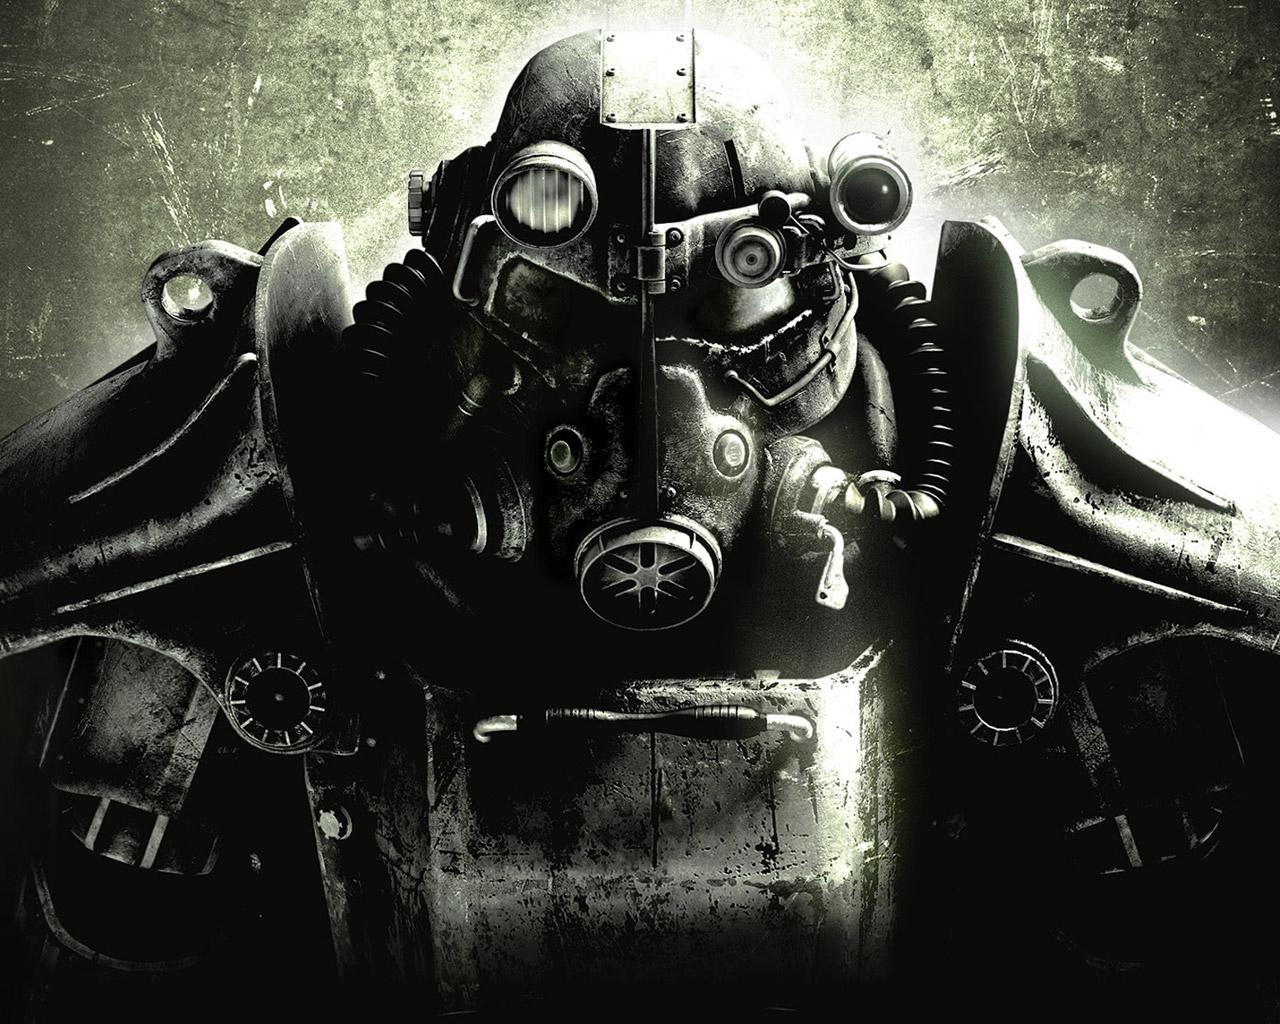 Free Fallout 3 Wallpaper in 1280x1024